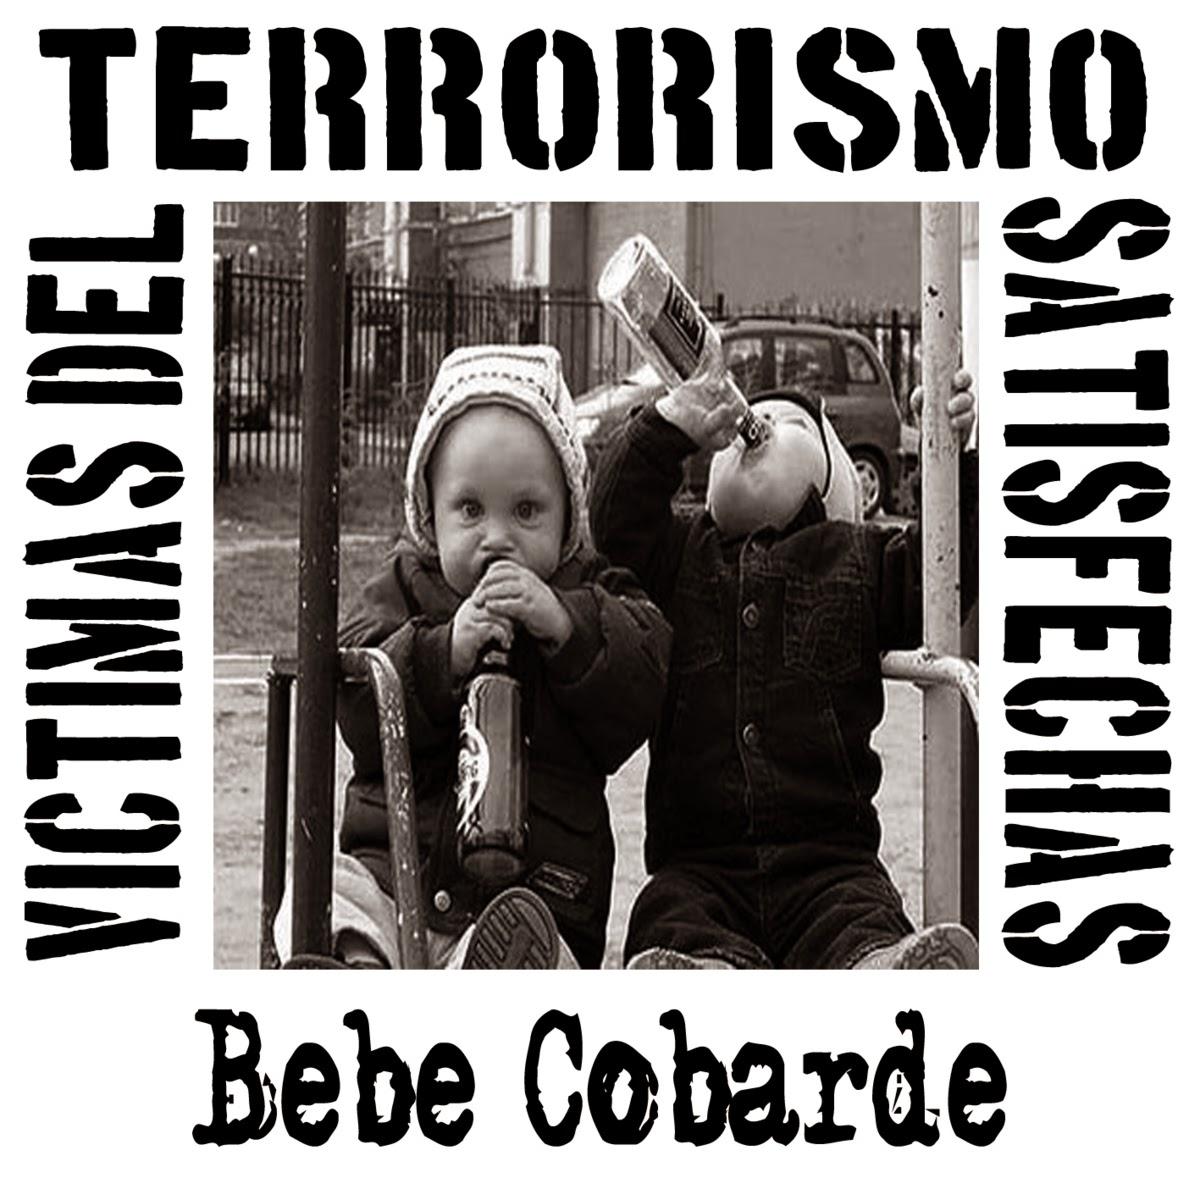 victimas terrorismo: